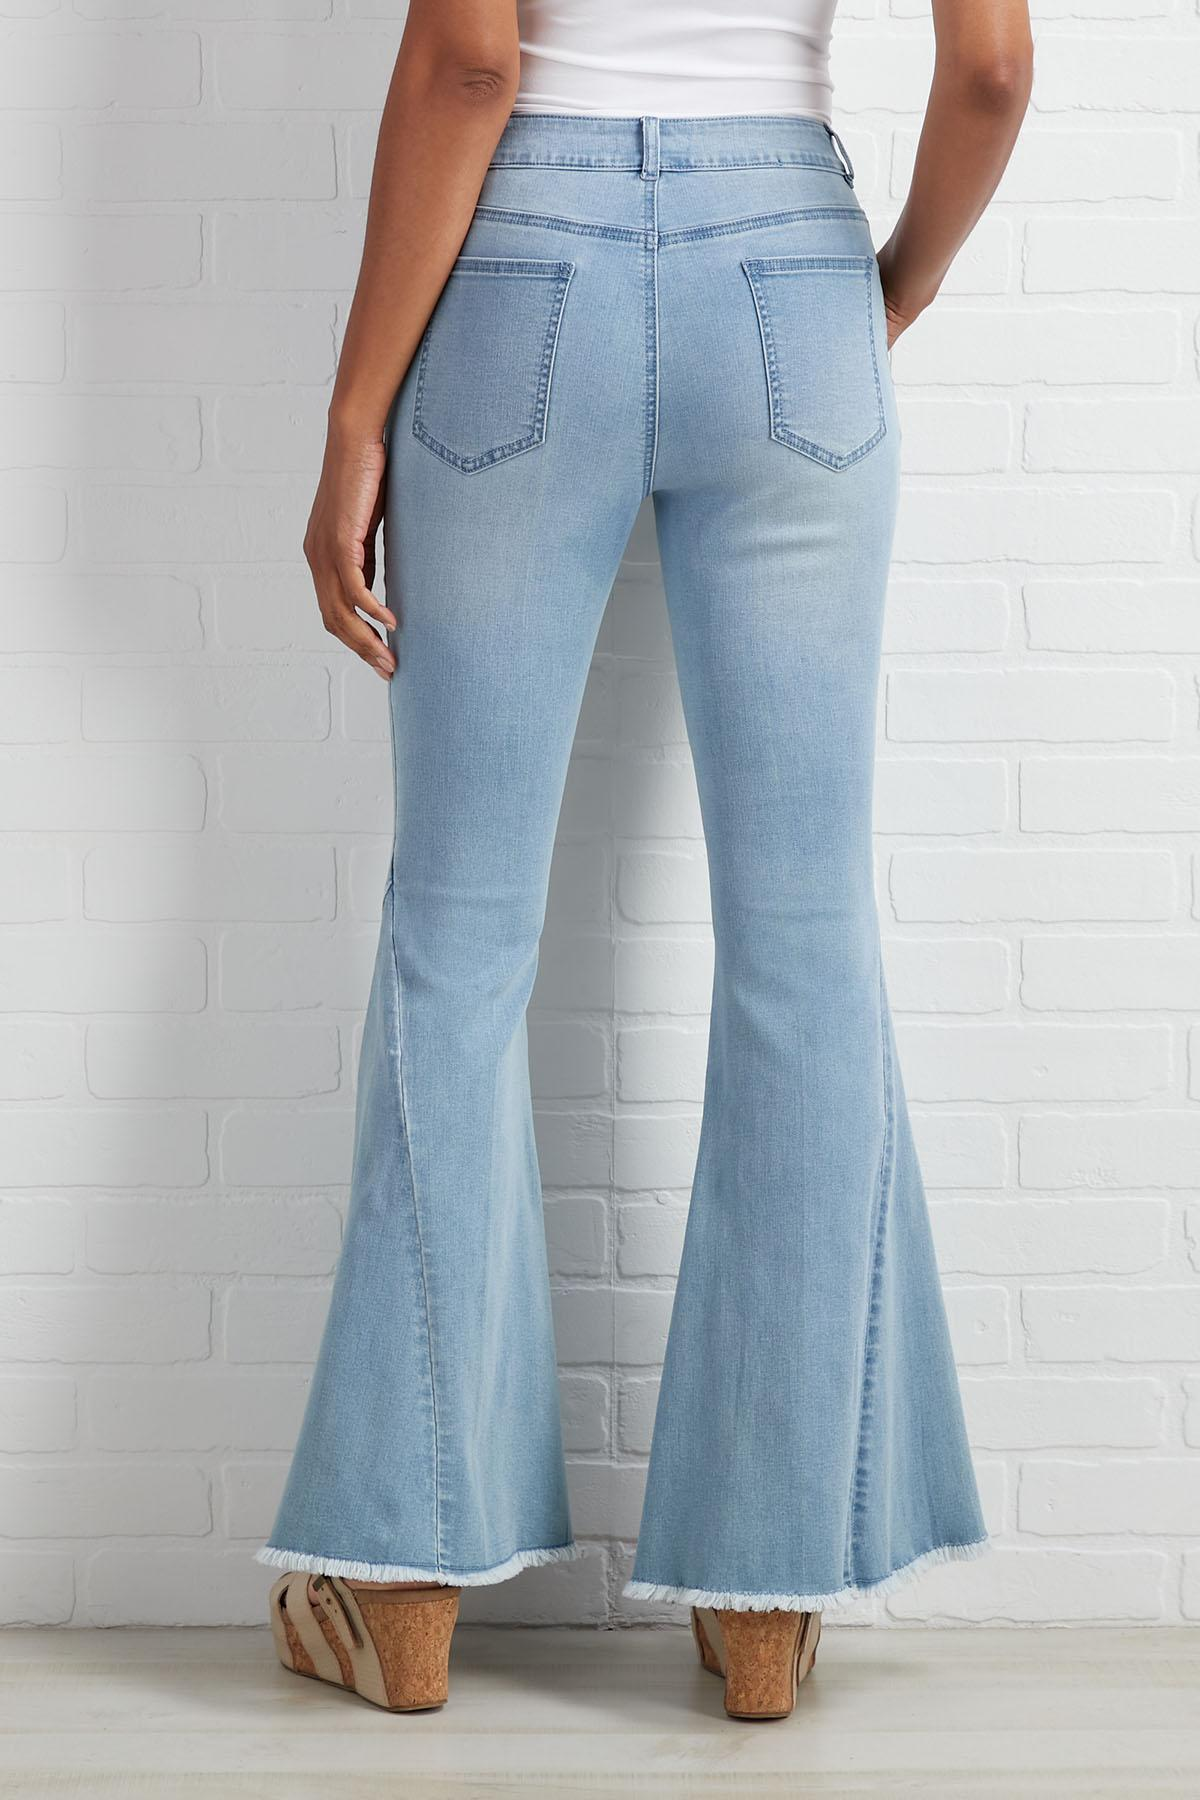 Get Groovin ` Jeans